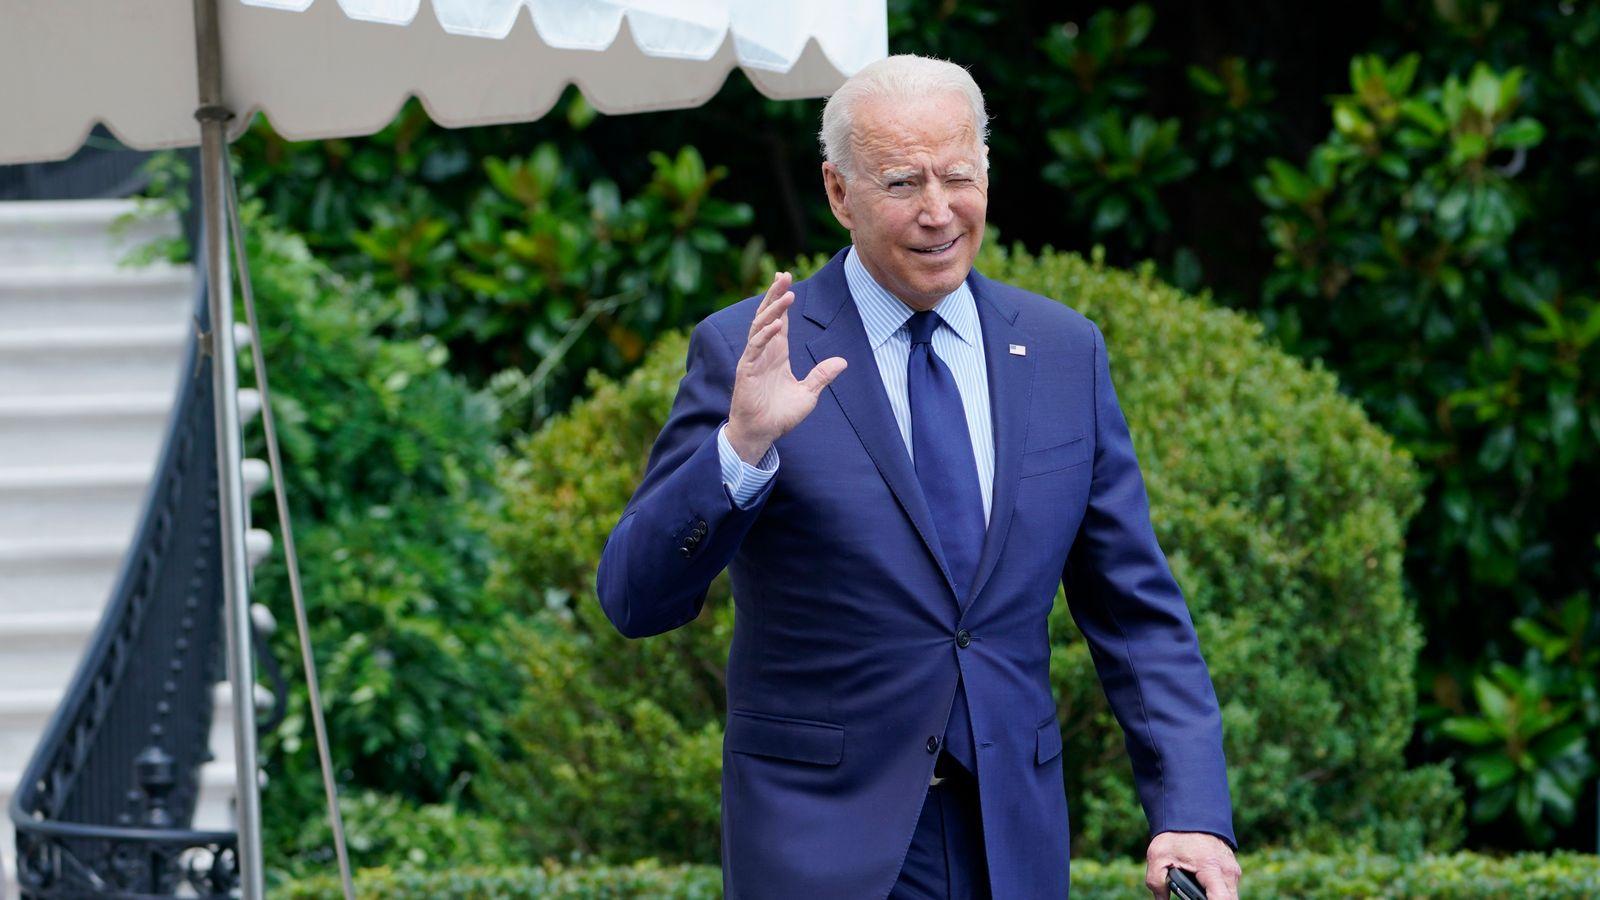 COVID-19: Vaccine and virus disinformation on platforms like Facebook 'killing people', says President Joe Biden